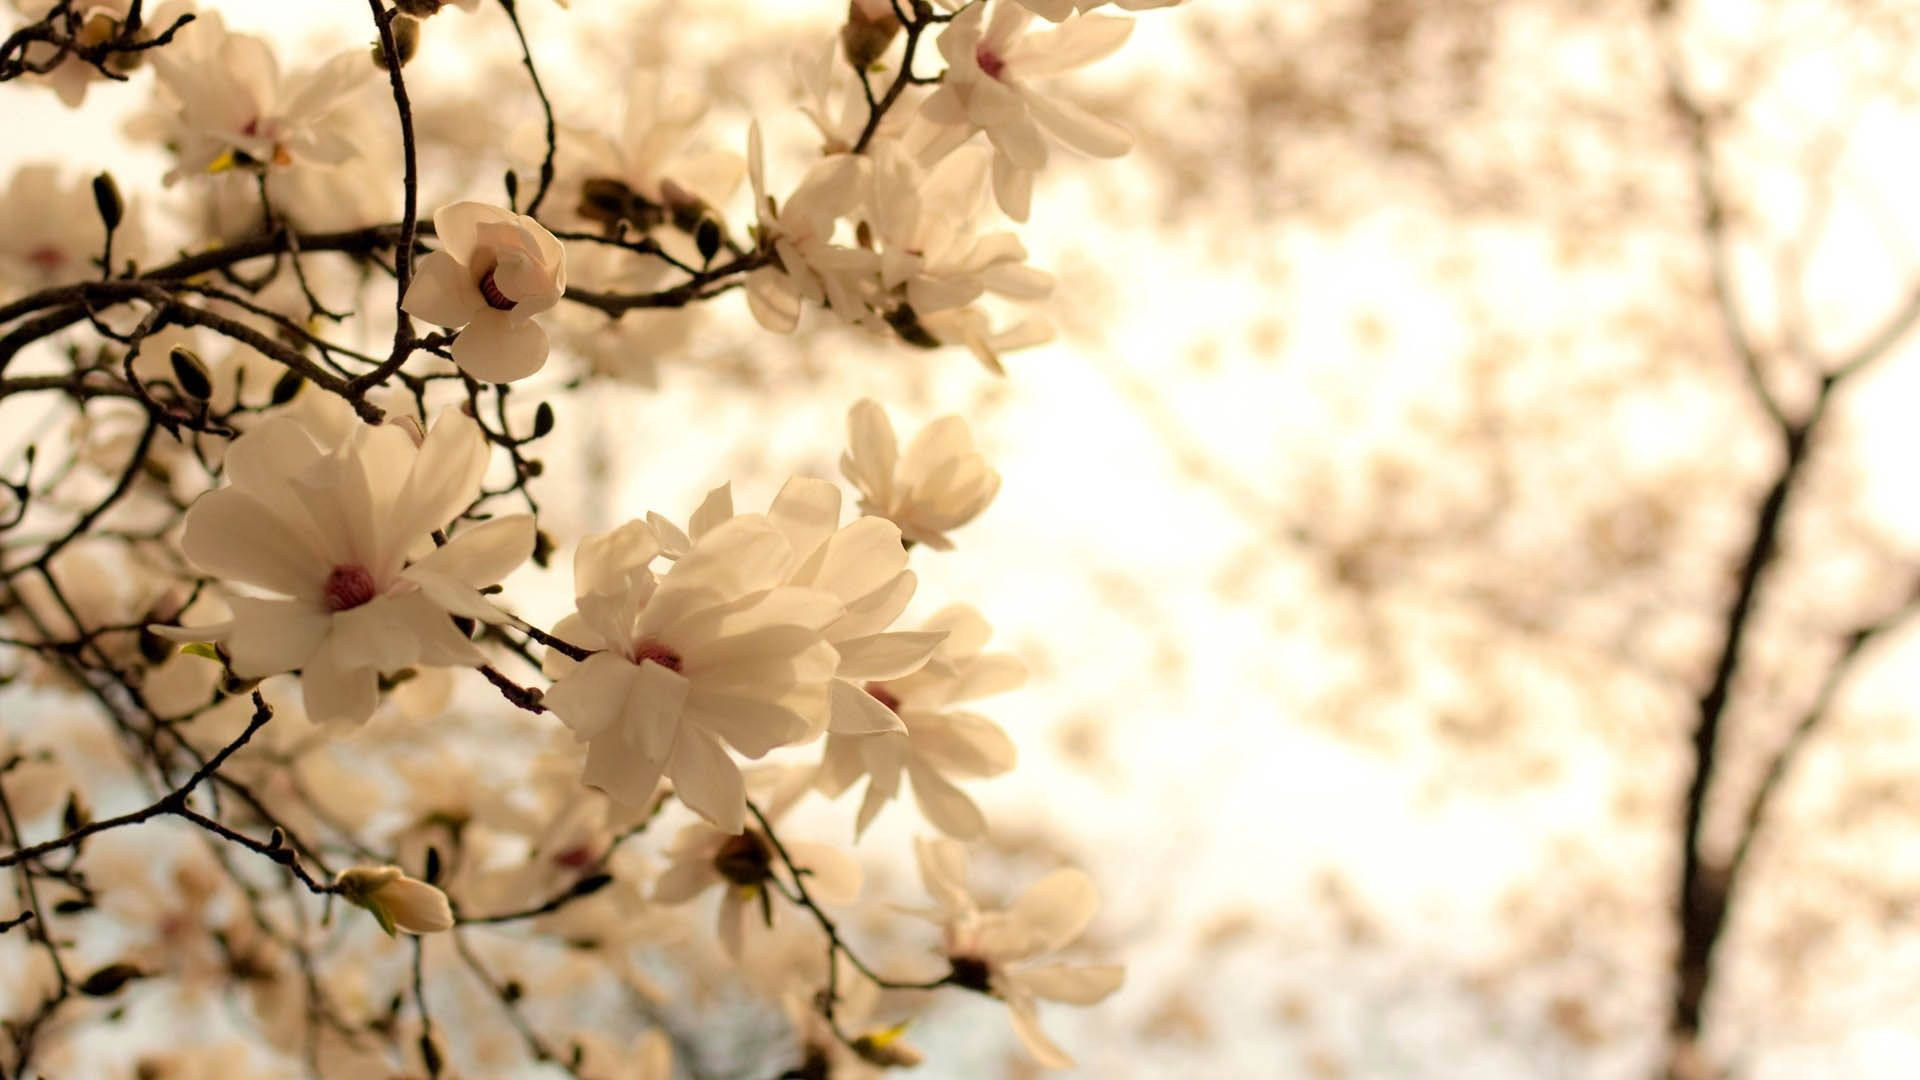 Cute Spring 1080p